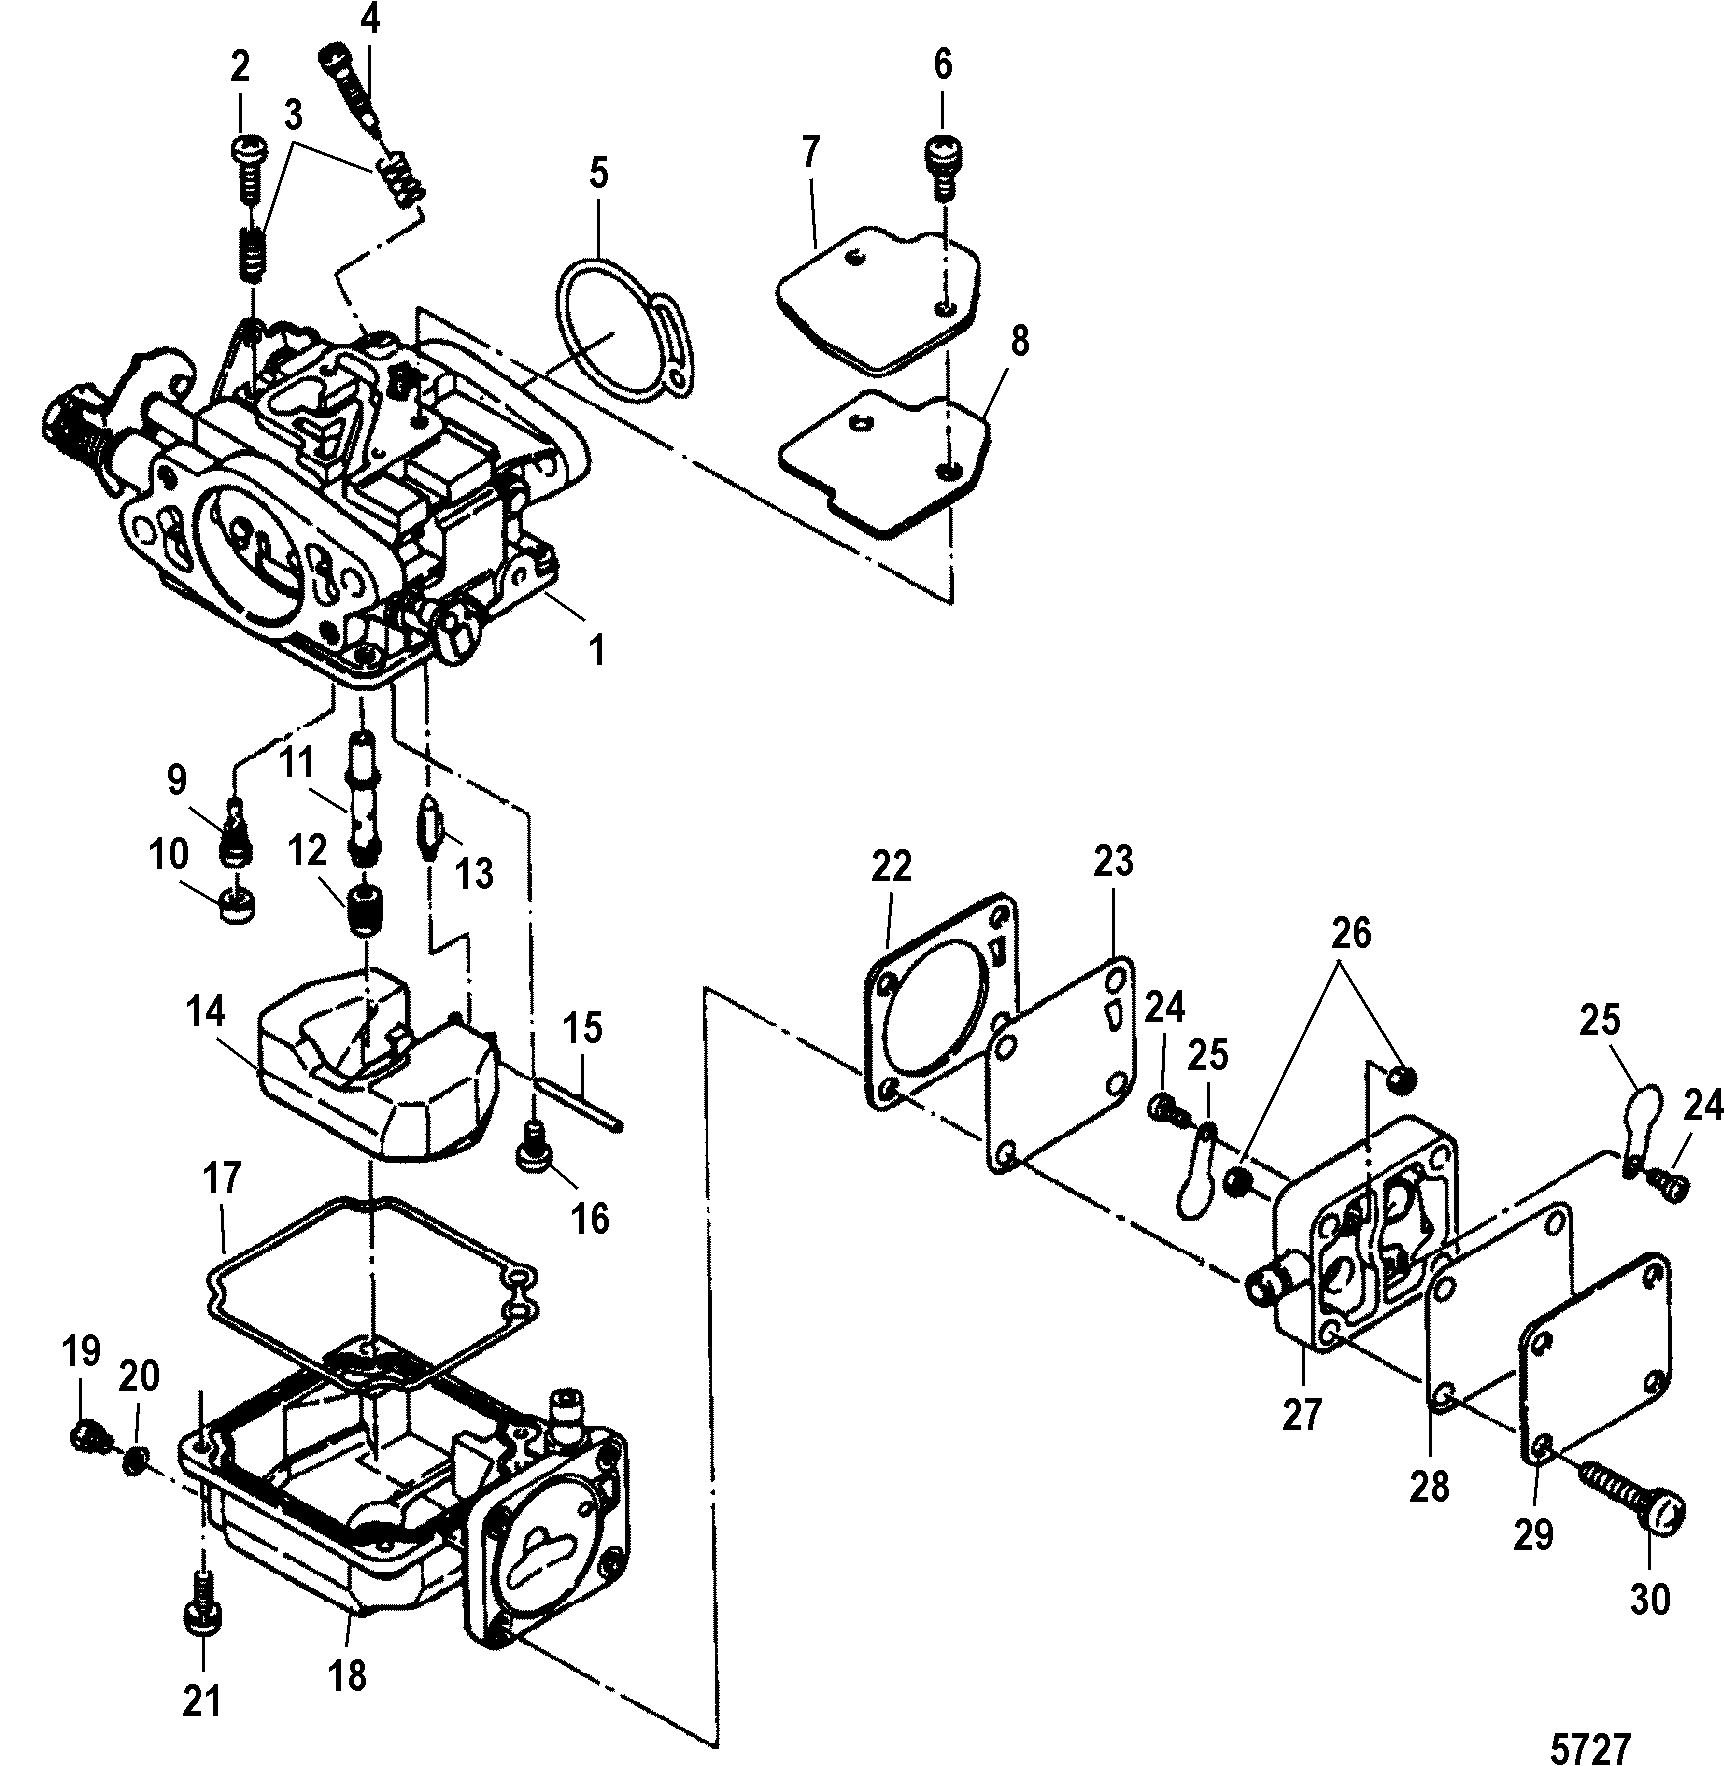 Carburetor For Mariner Mercury 15 18 Hp 2 Cylinder International Wiring Diagram